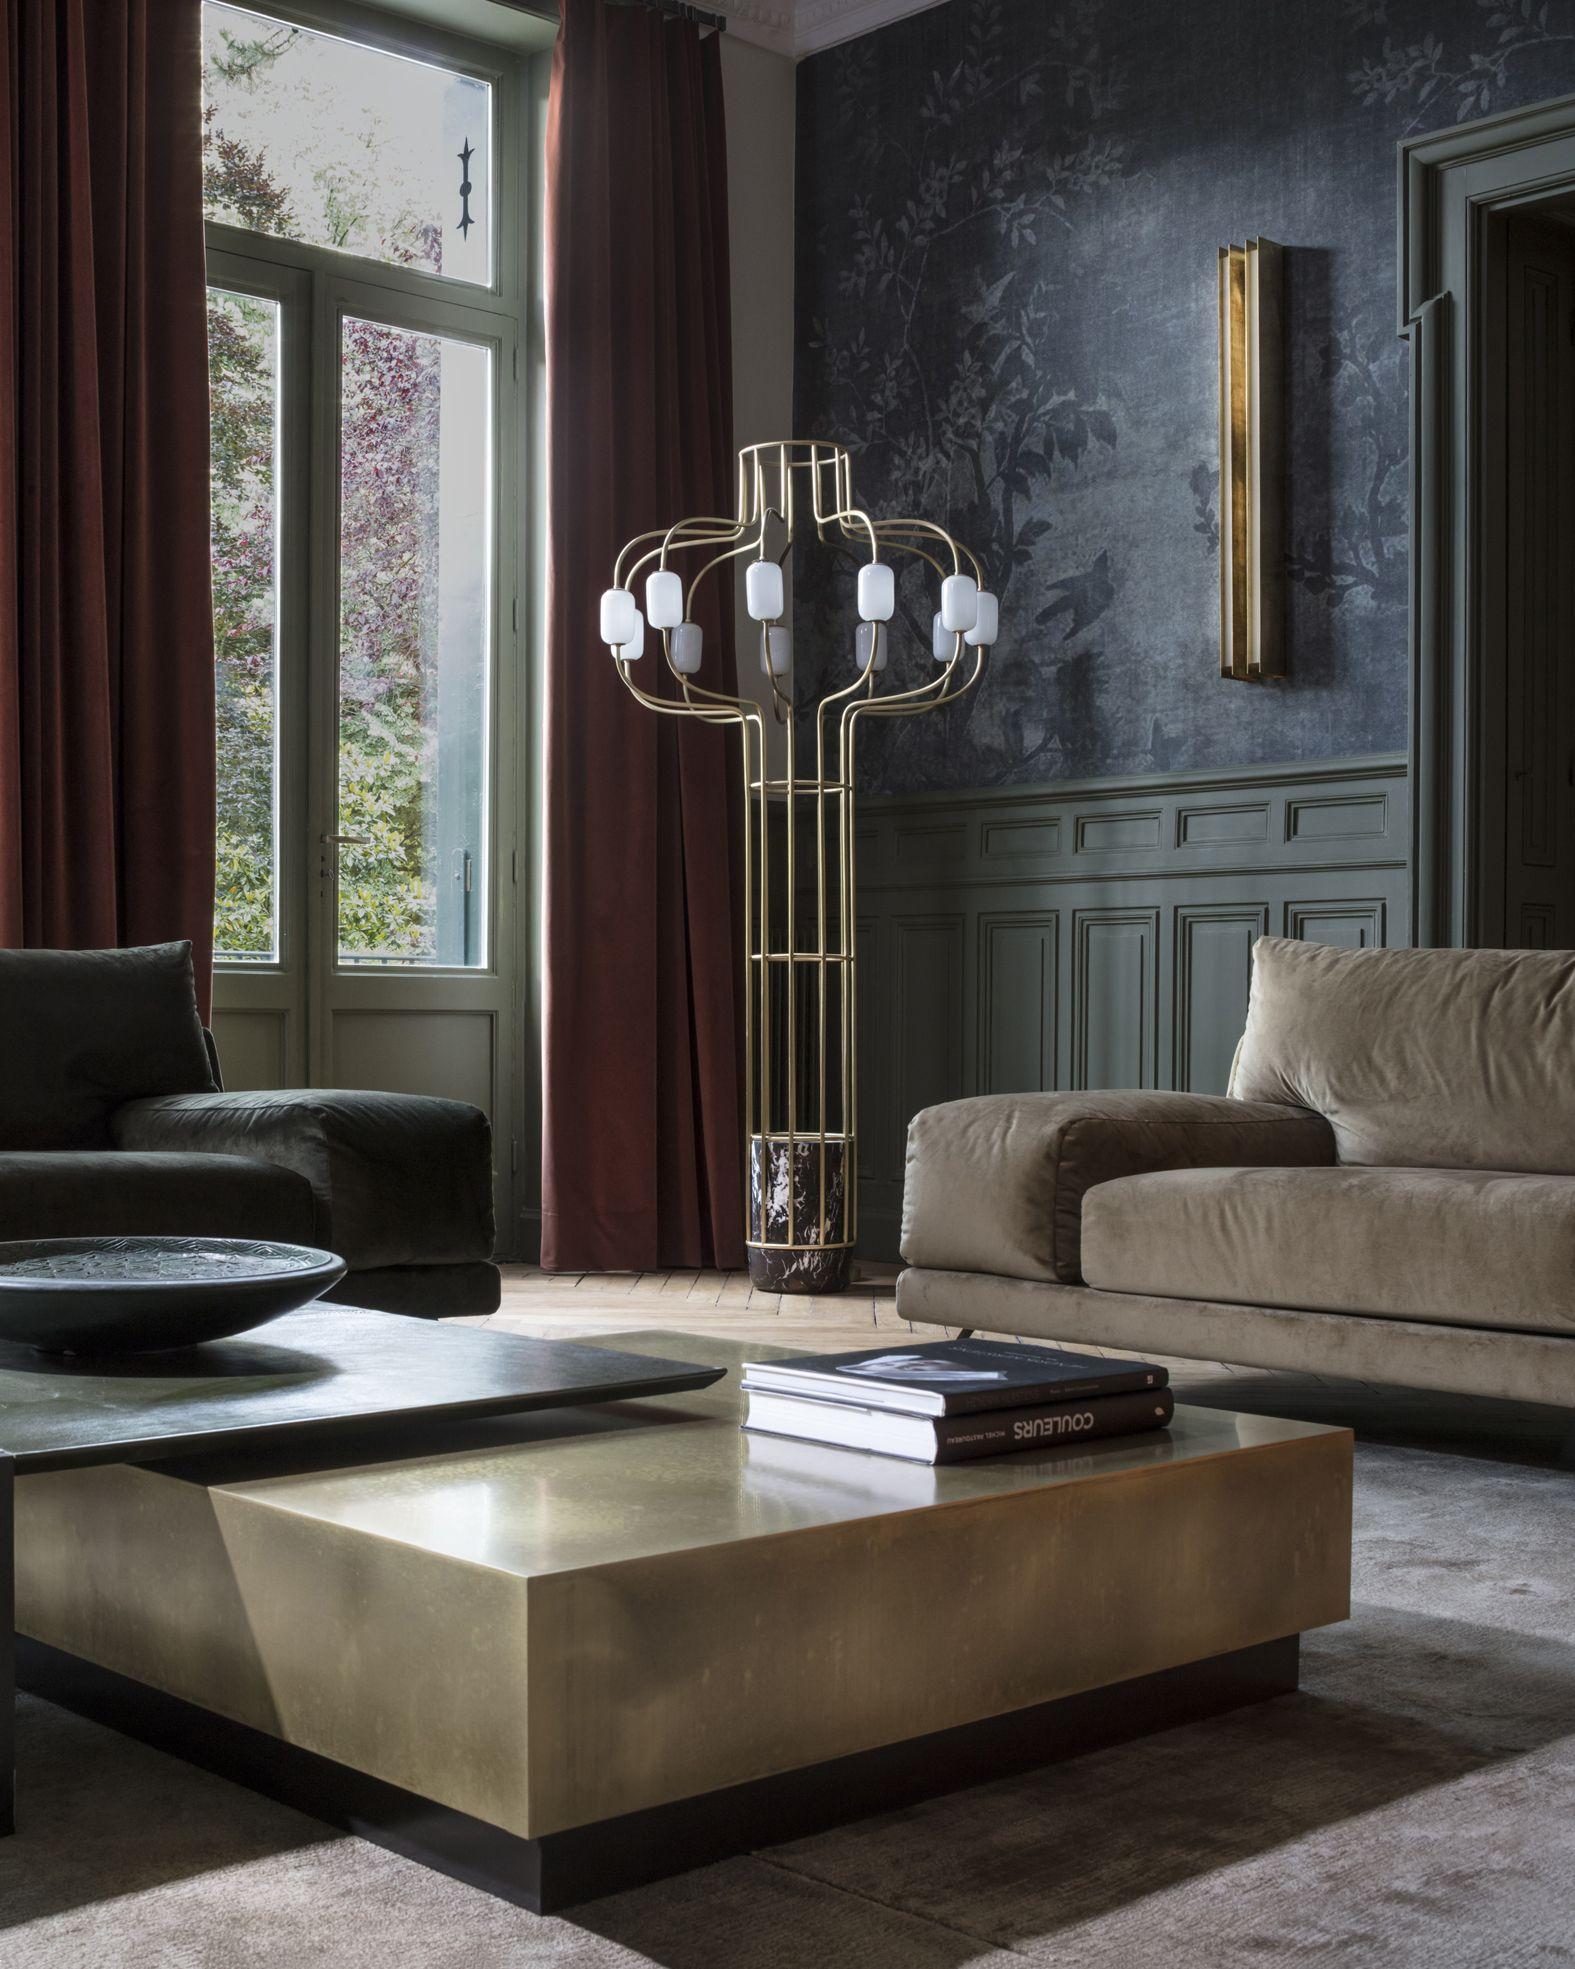 Interior Design Lyon Christophe Delcourt Collection Particuliere